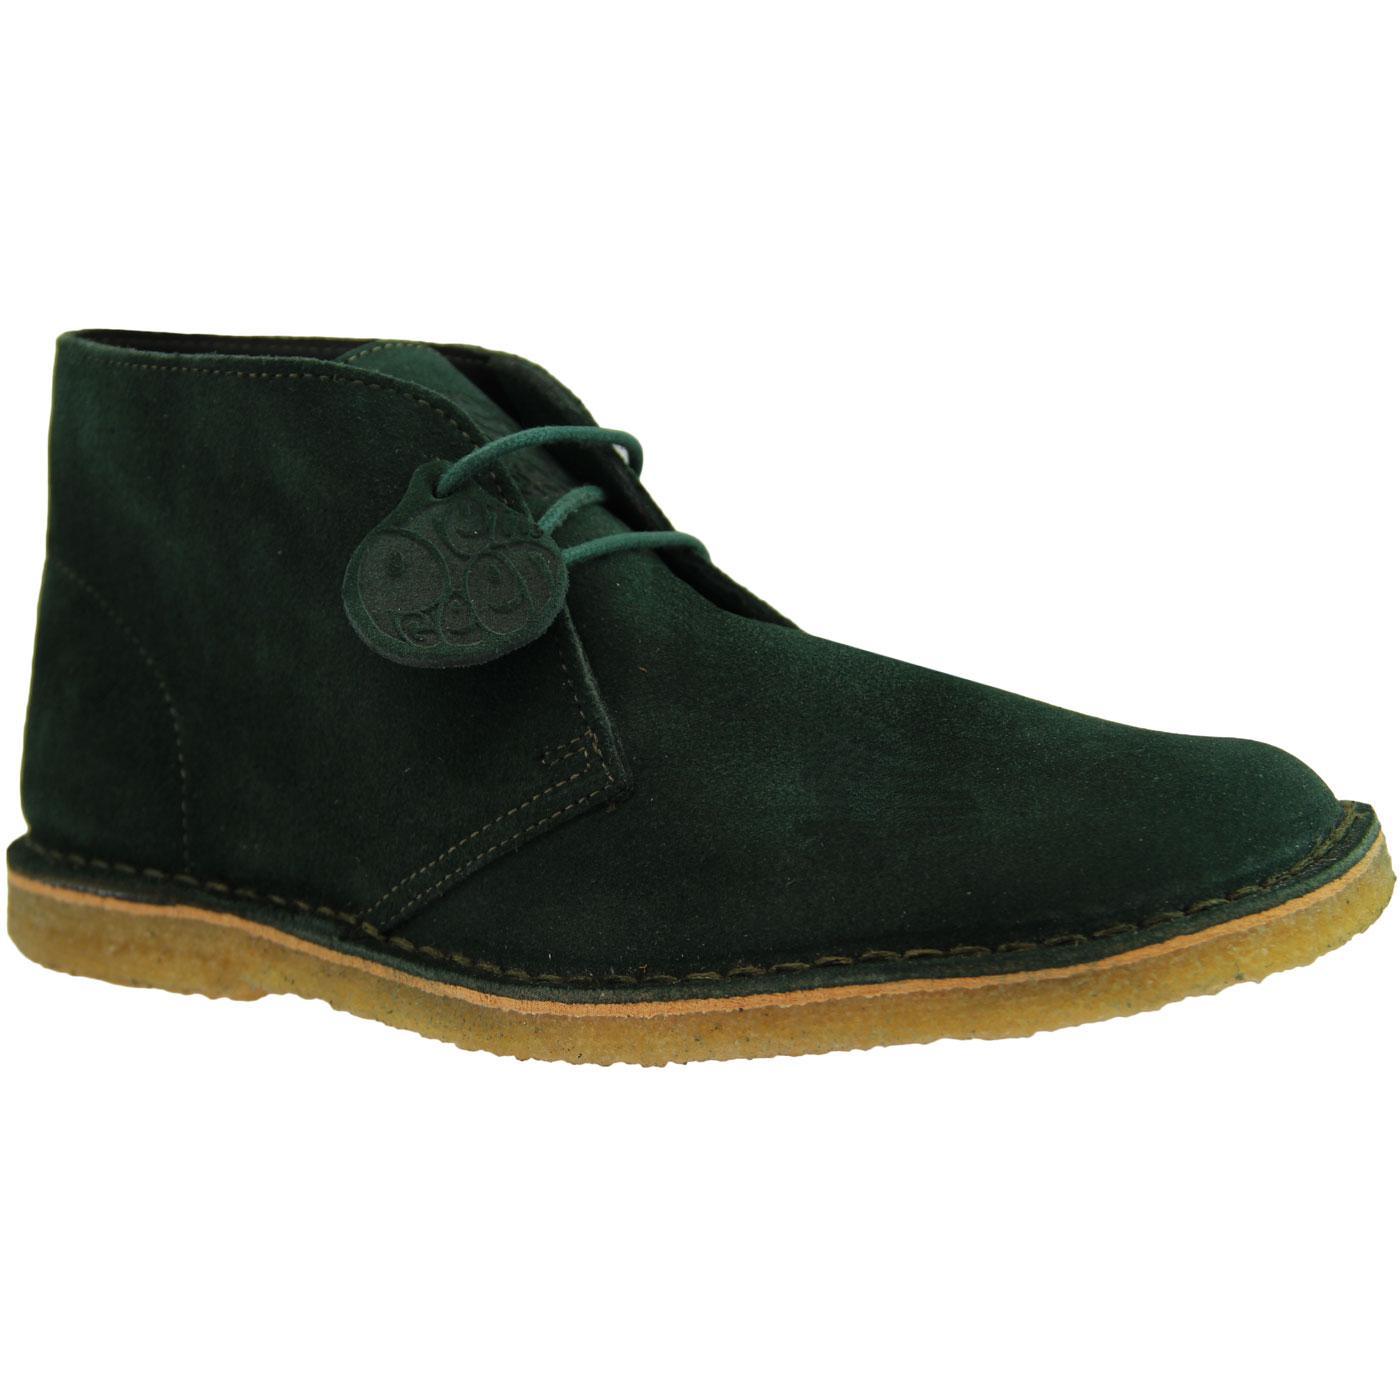 PRETTY GREEN Mod Suede Crepe Sole Desert Boots DG